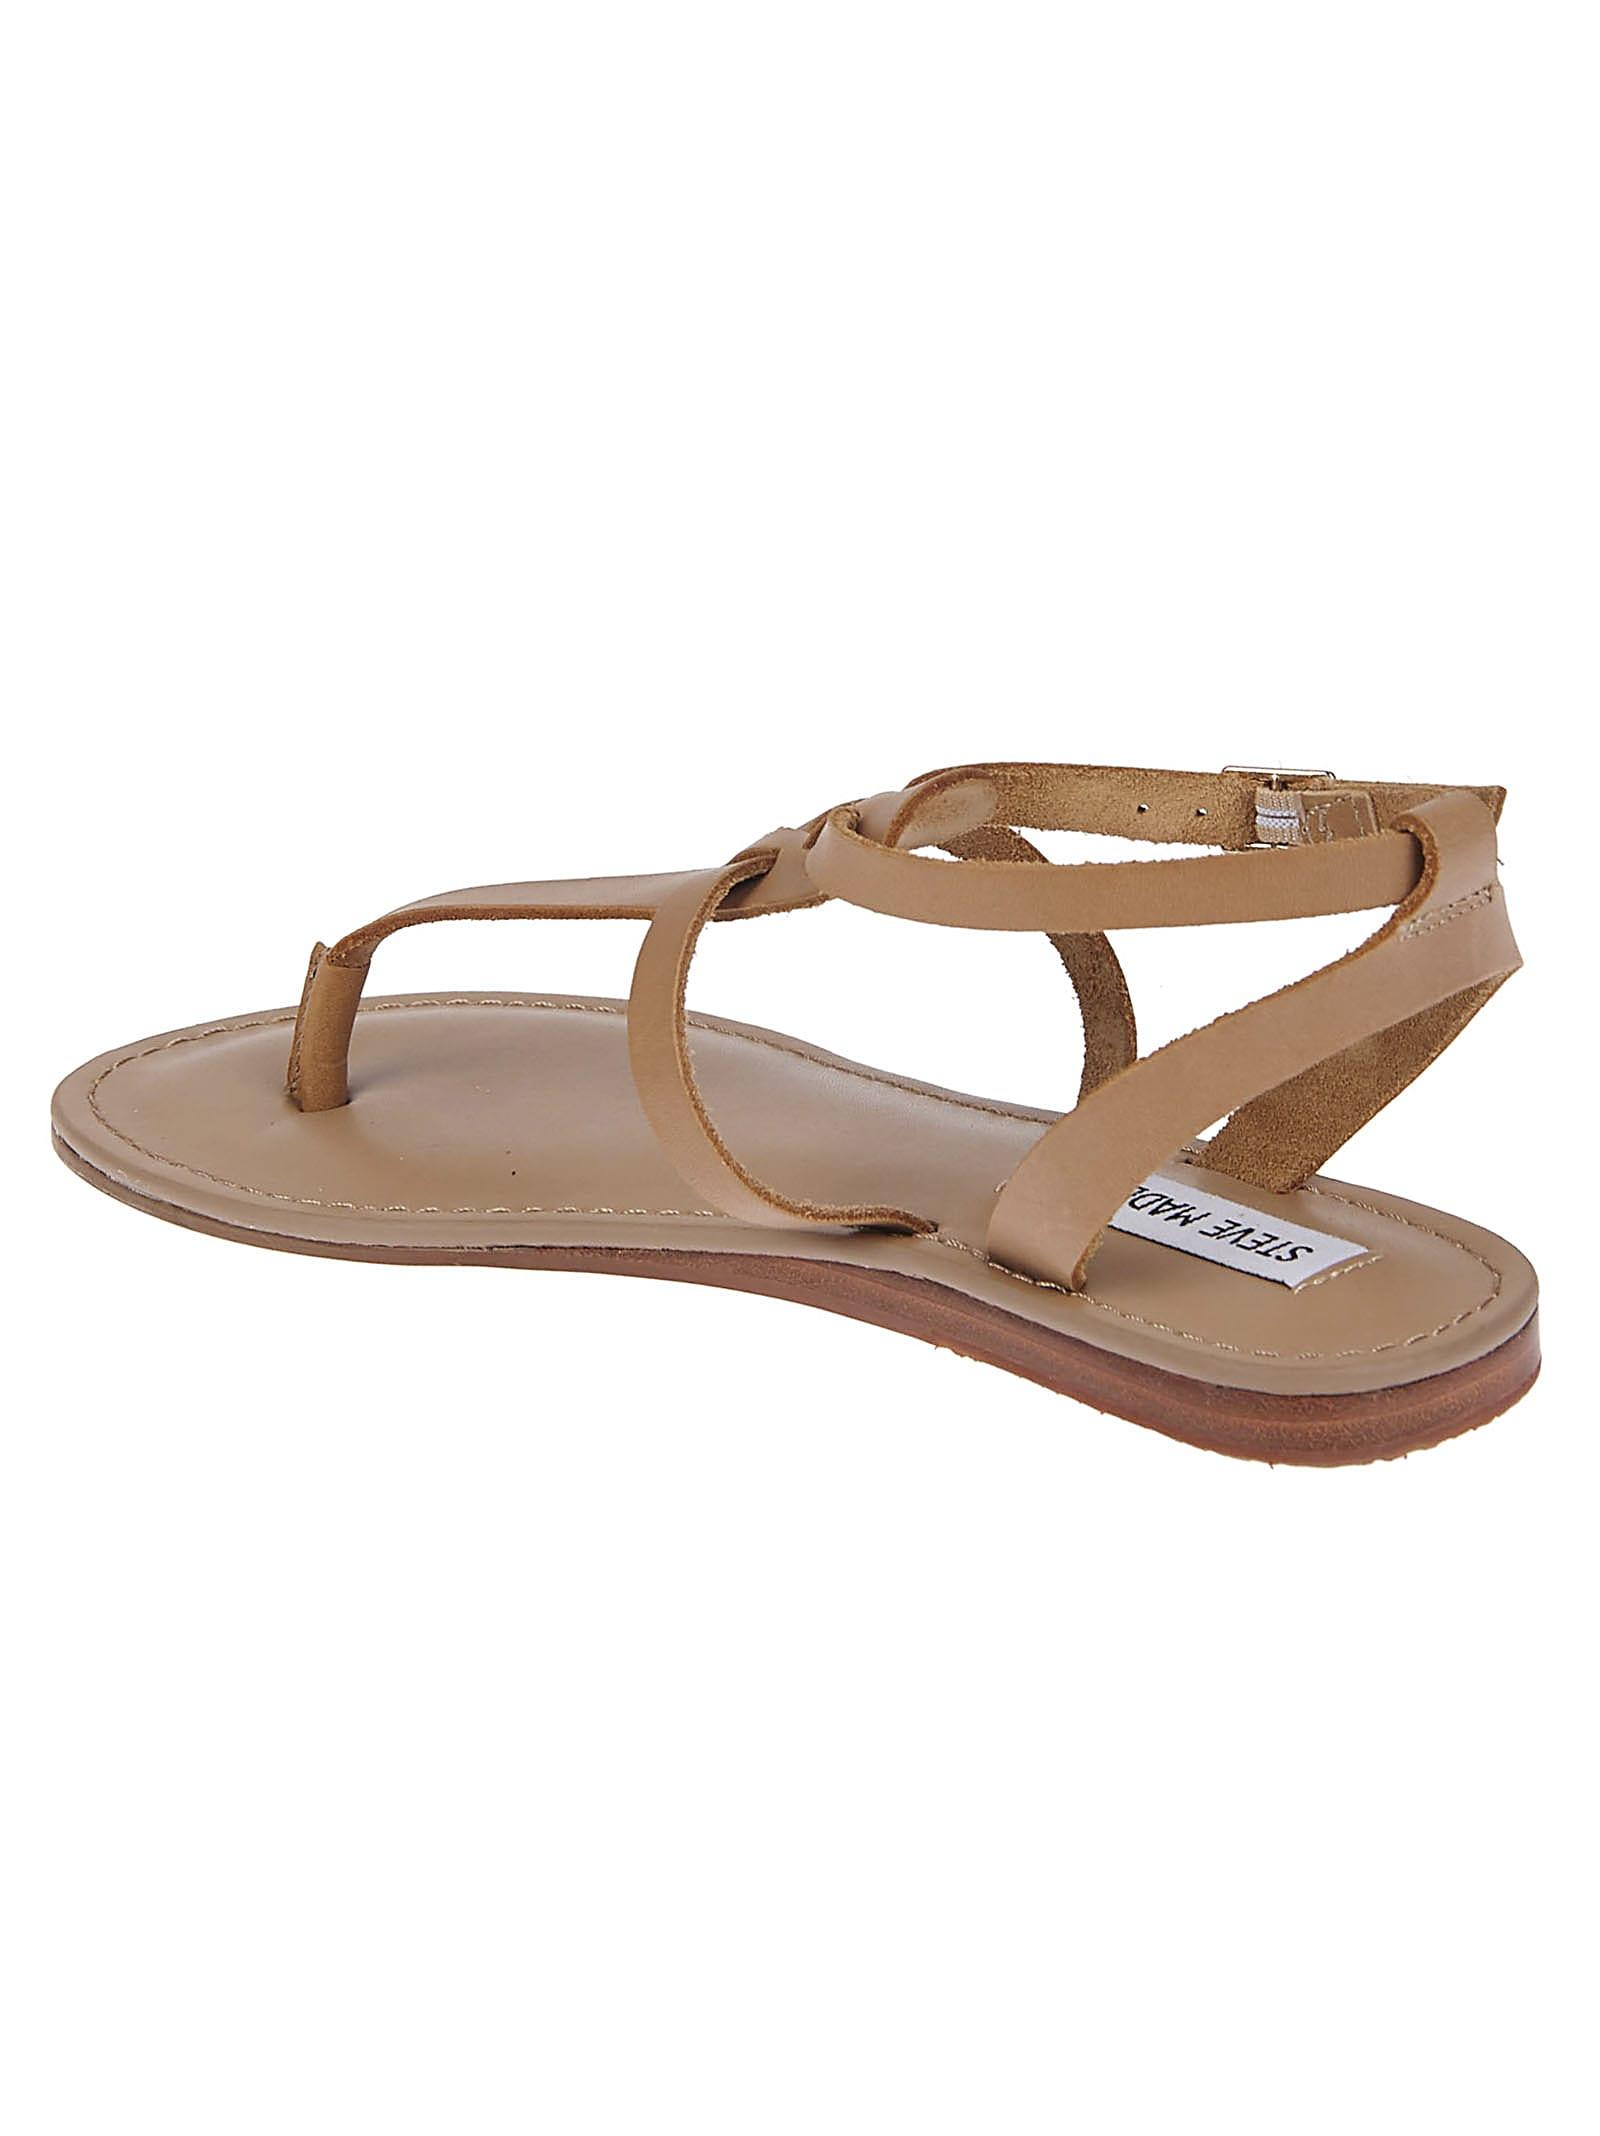 Sandals Strap Madden Flat Steve Brown Ankle 3Ajc5qRS4L